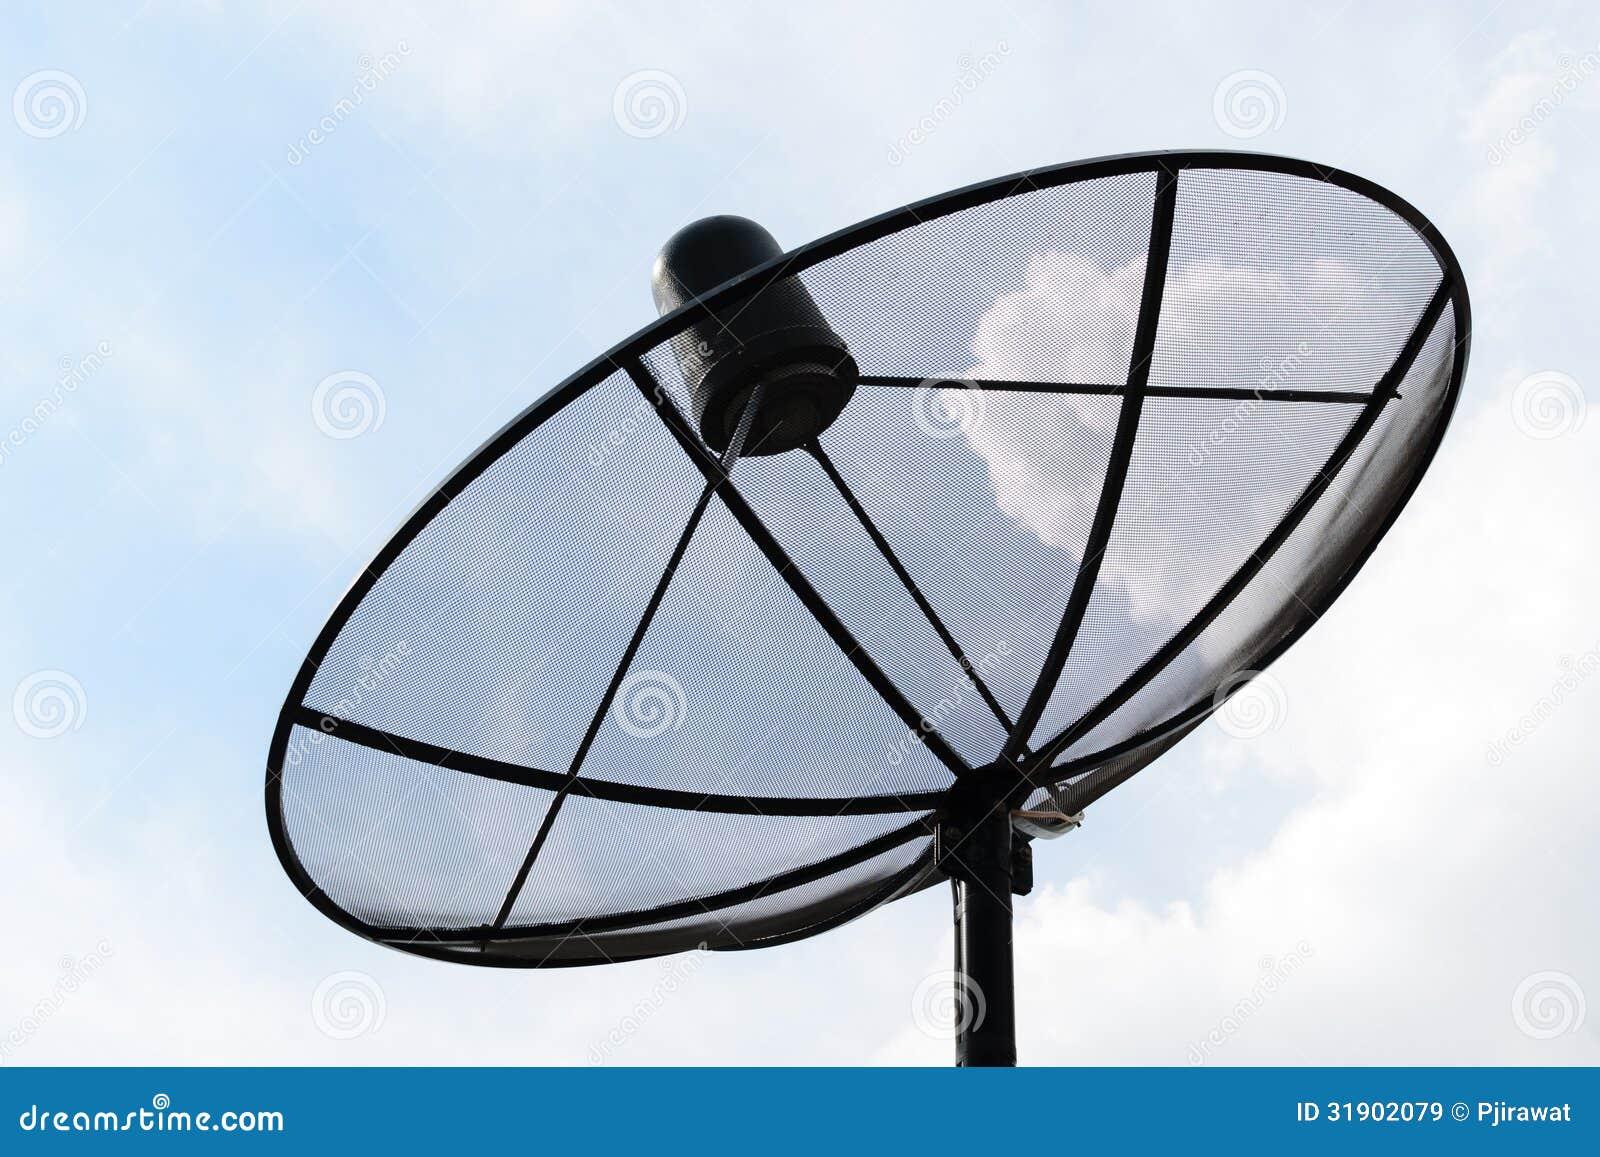 Satellite Dish Royalty Free Stock Images - Image: 31902079